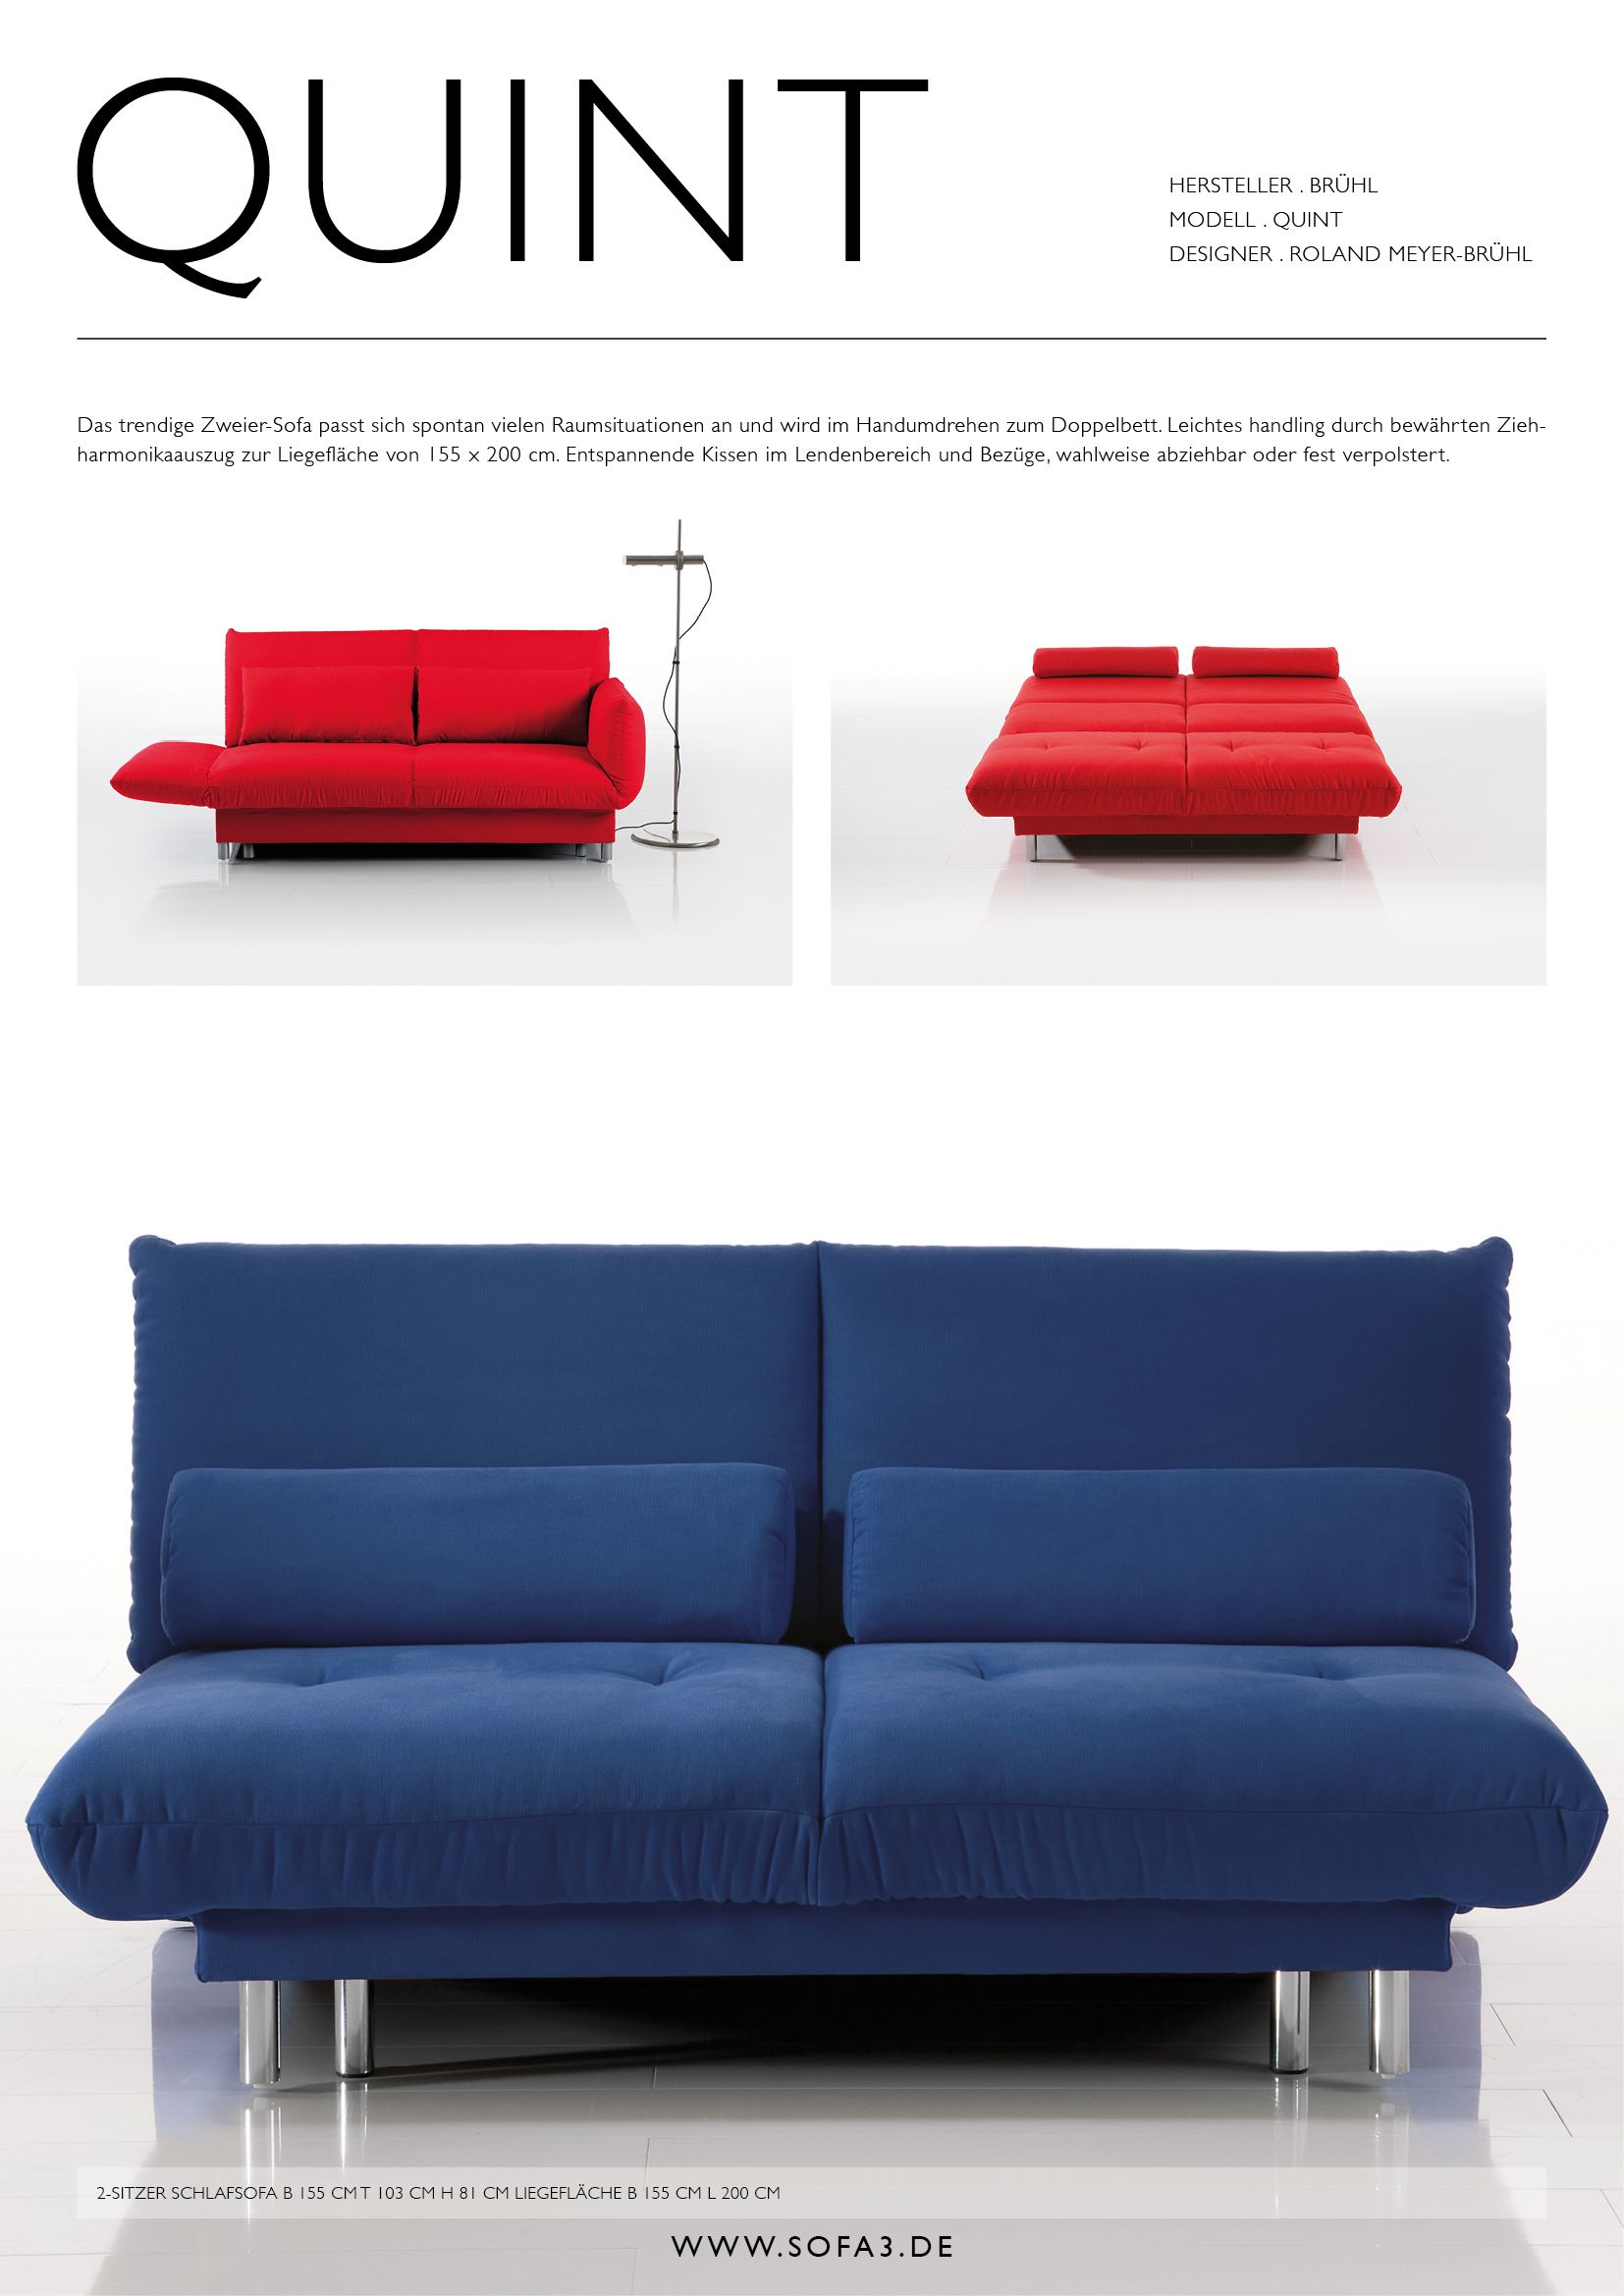 Quint Bruhl Bruehl Roland Meyer Bruhl Sofas Sofa Sofa3